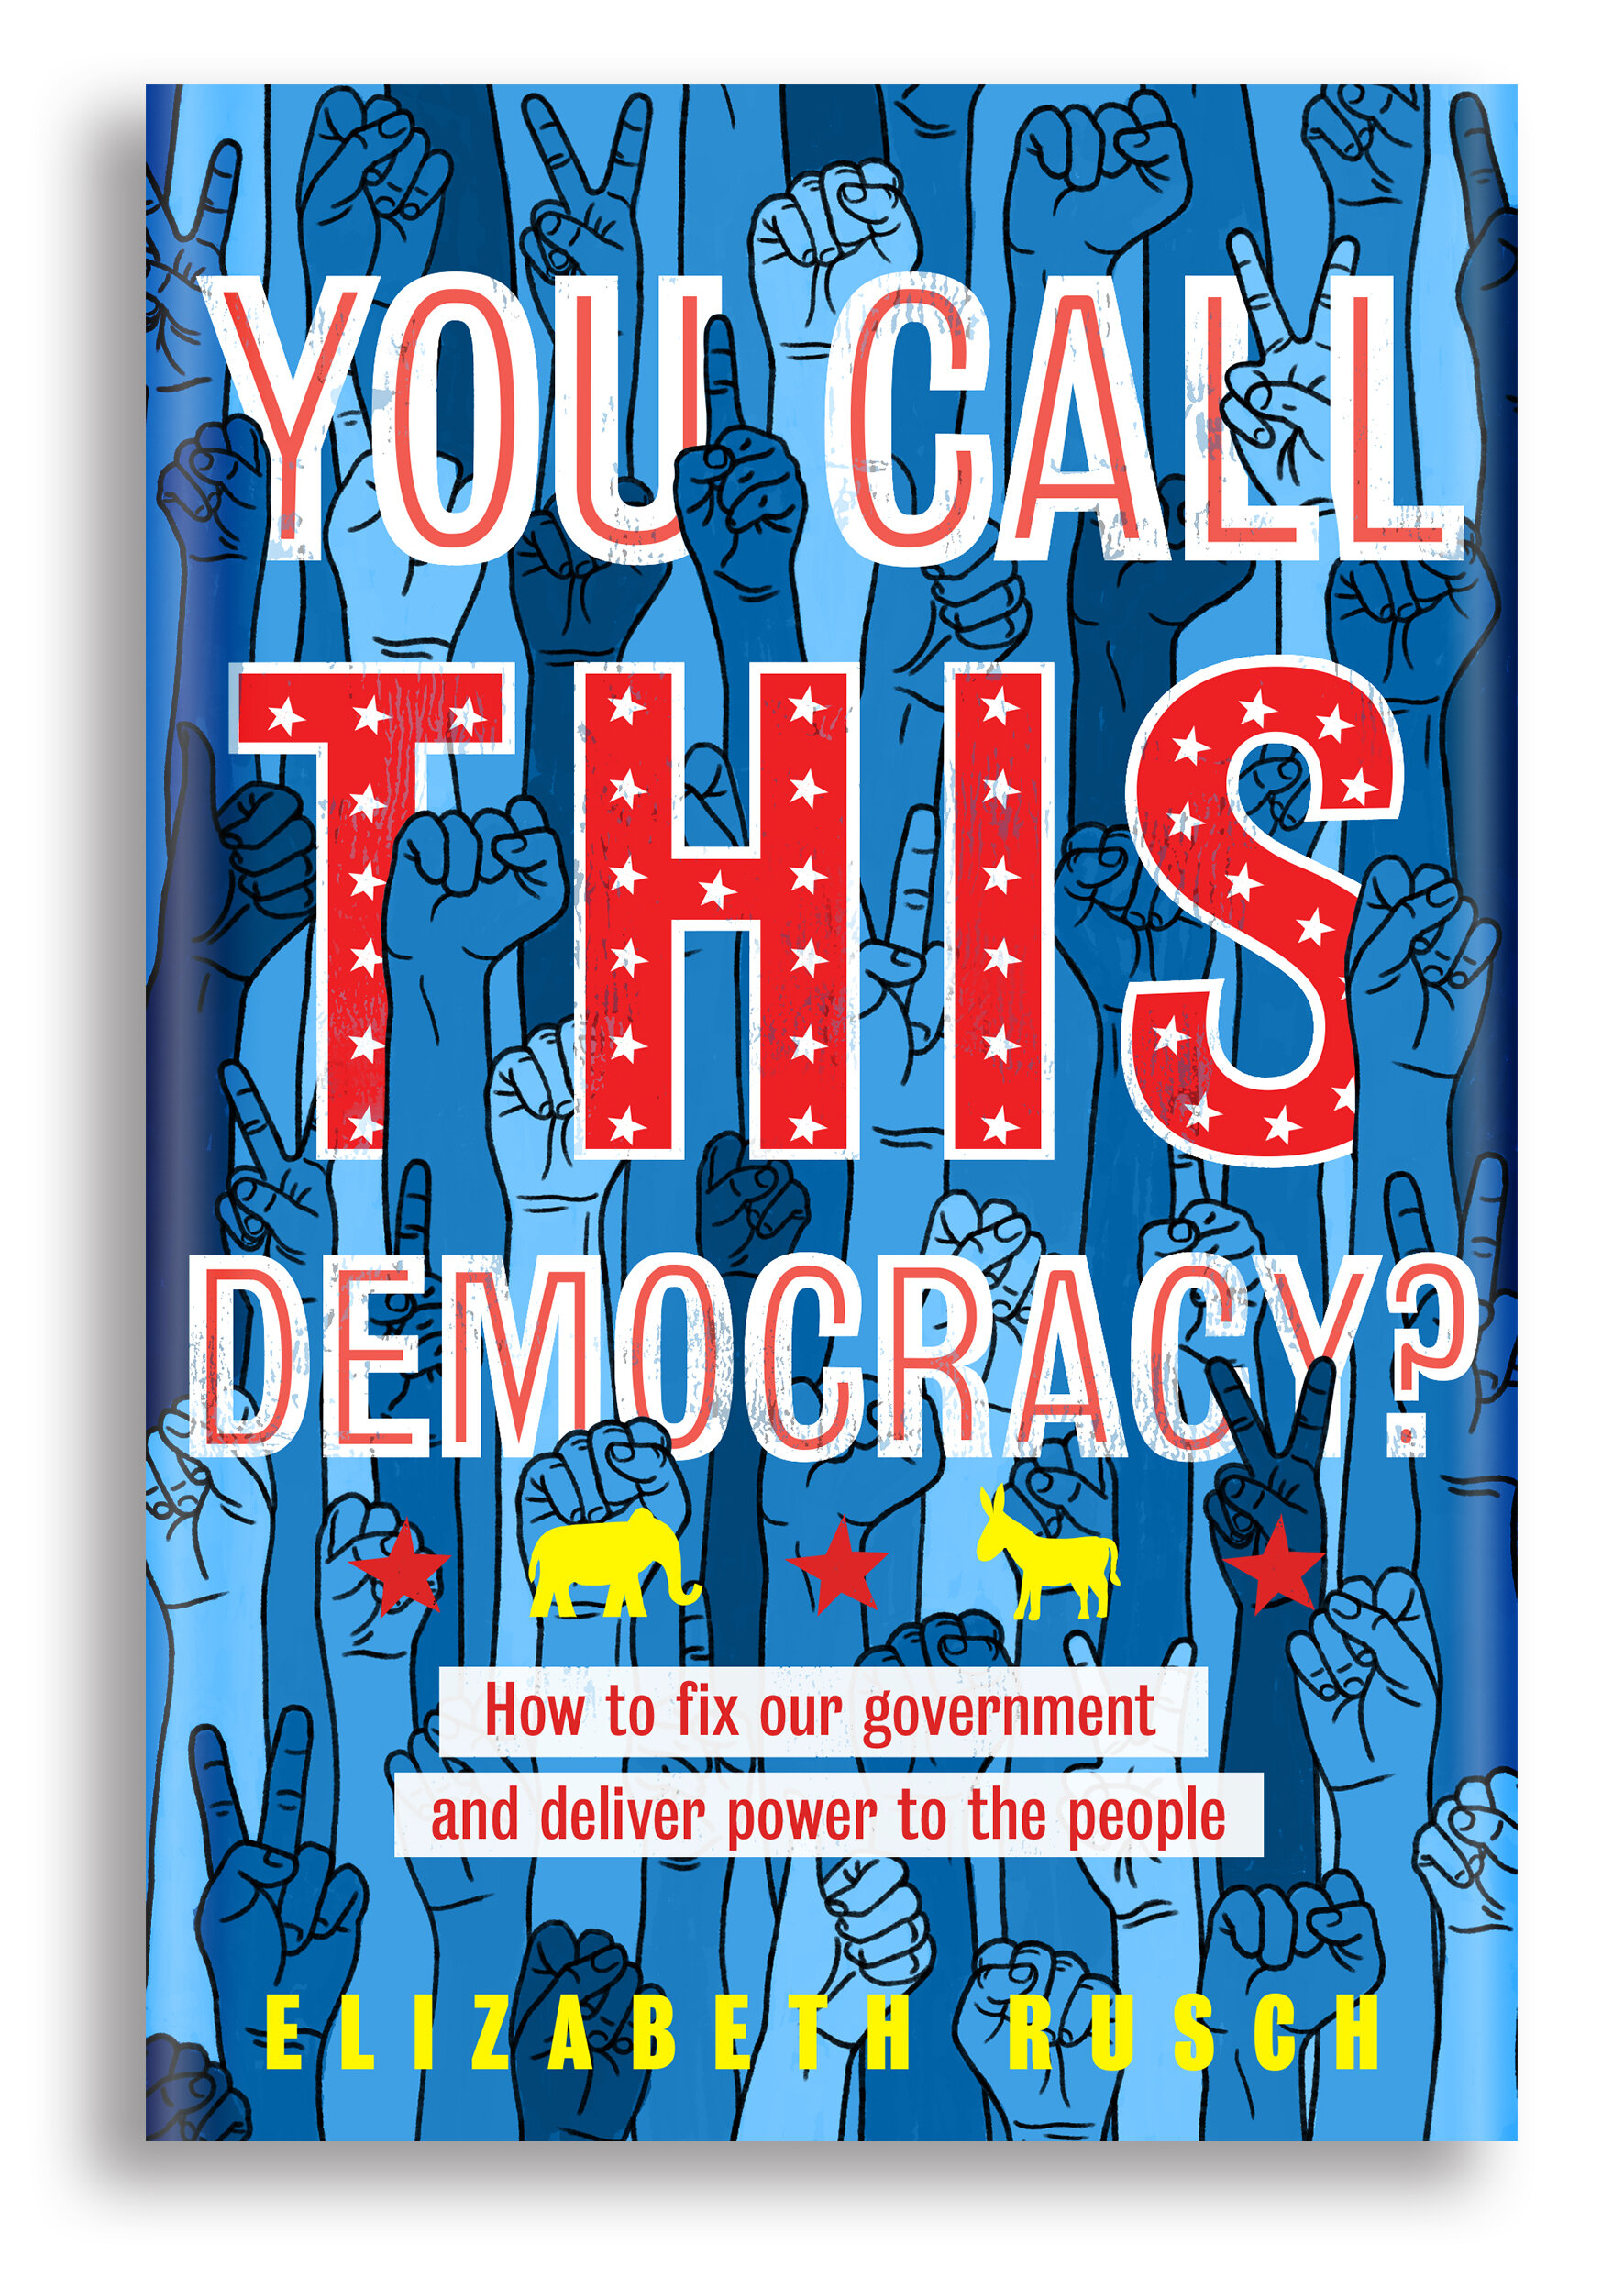 Democracy_page.jpg